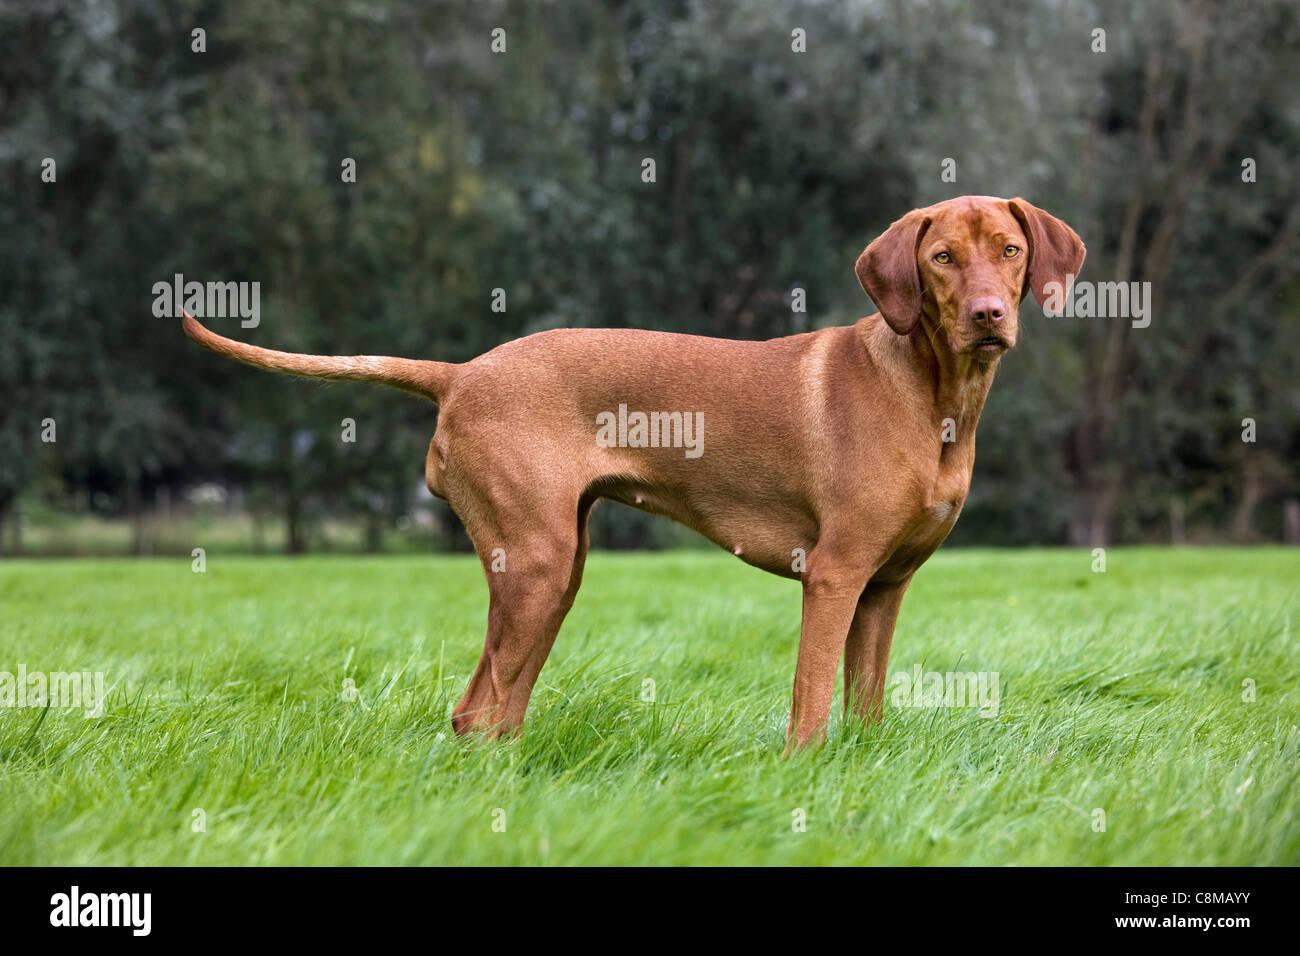 Hungarian Vizsla hunting dog with golden rust coat (Canis lupus familiaris) in garden, Belgium - Stock Image